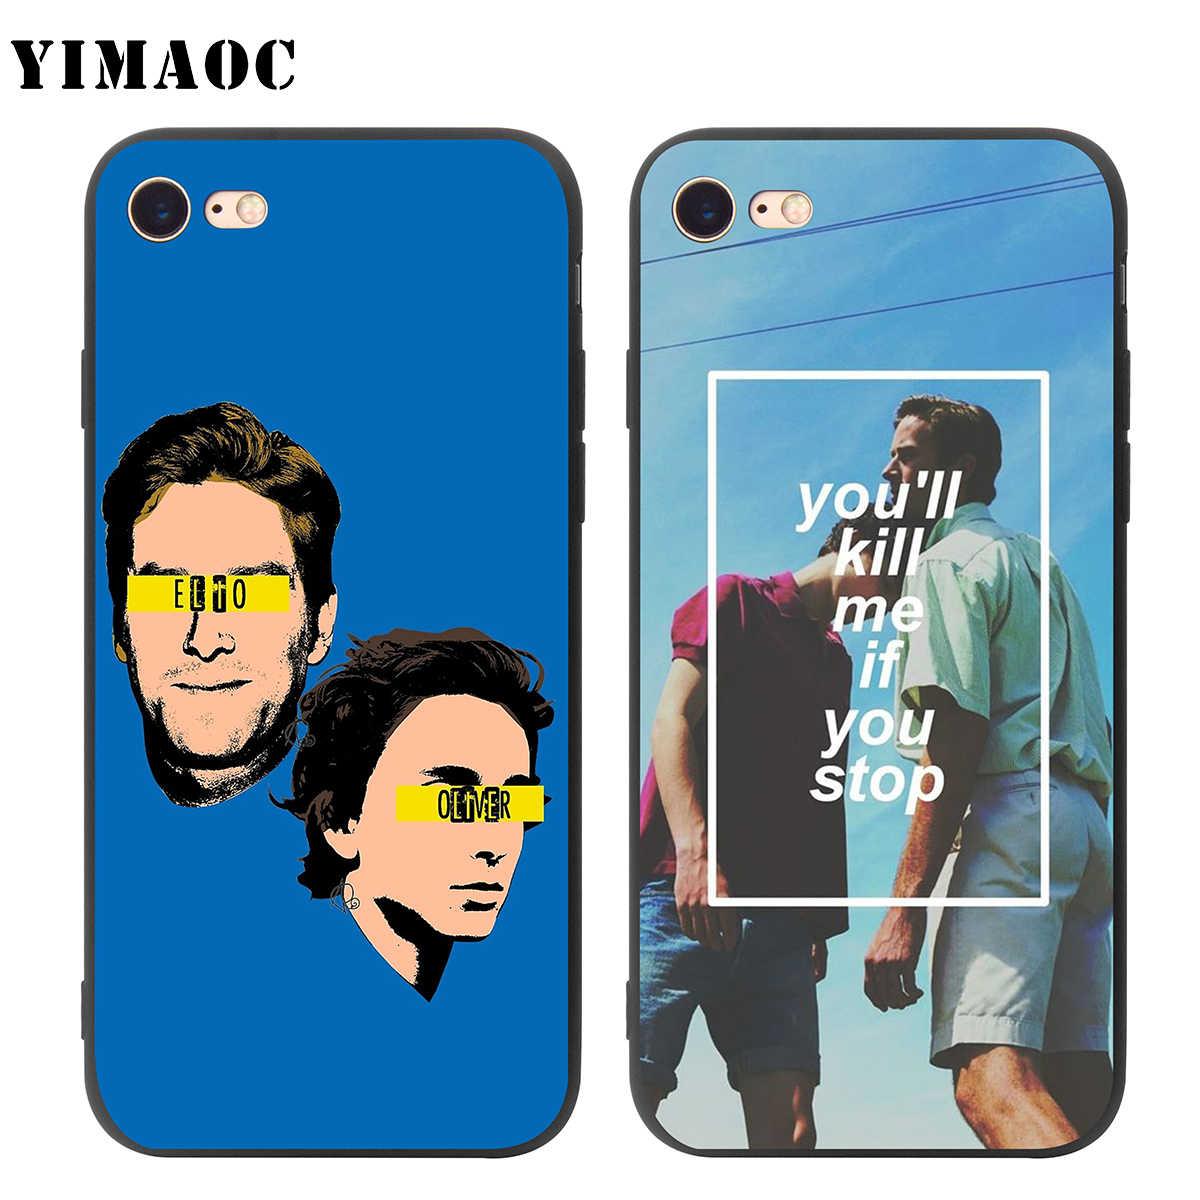 YIMAOC Call Me โดยของคุณชื่อนุ่มซิลิโคนสำหรับ iPhone 11 Pro XS MAX XR X 8 7 6 6S PLUS 5 5s SE